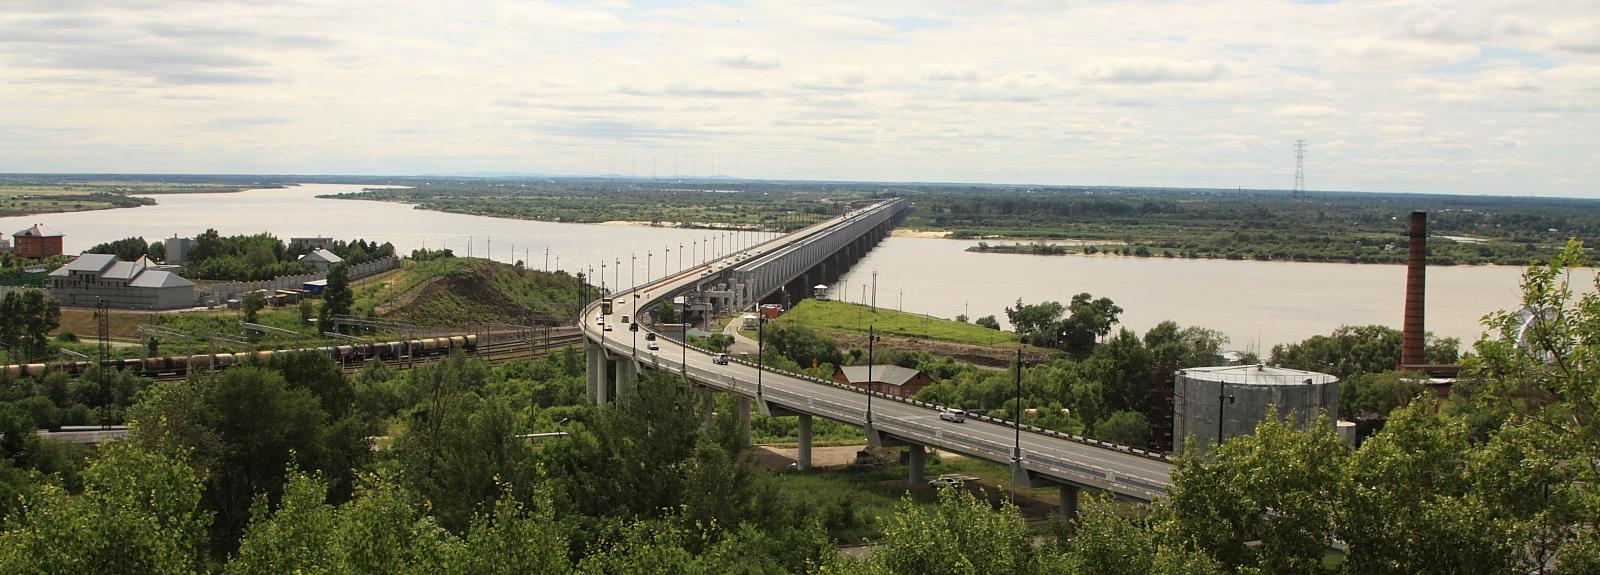 Мост через Амур. Панорама.